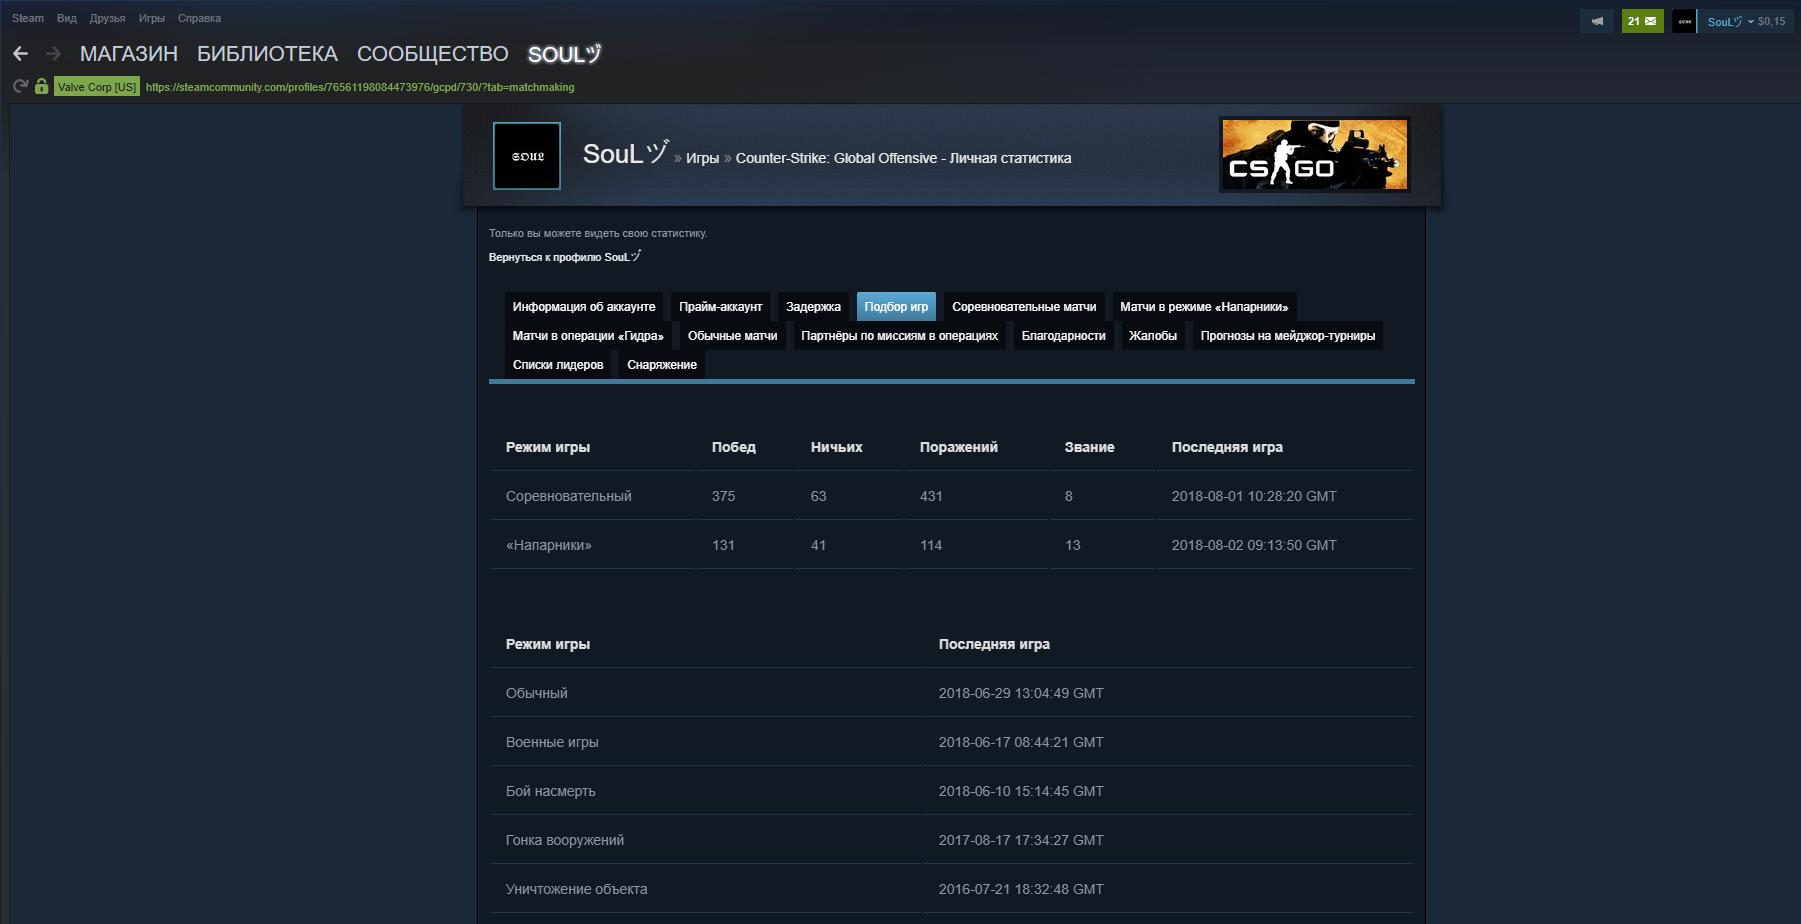 купить аккаунт CS:GO - 2 ЗВЕЗДЫ + 1500 РУБ ИНВЕНТАРЬ